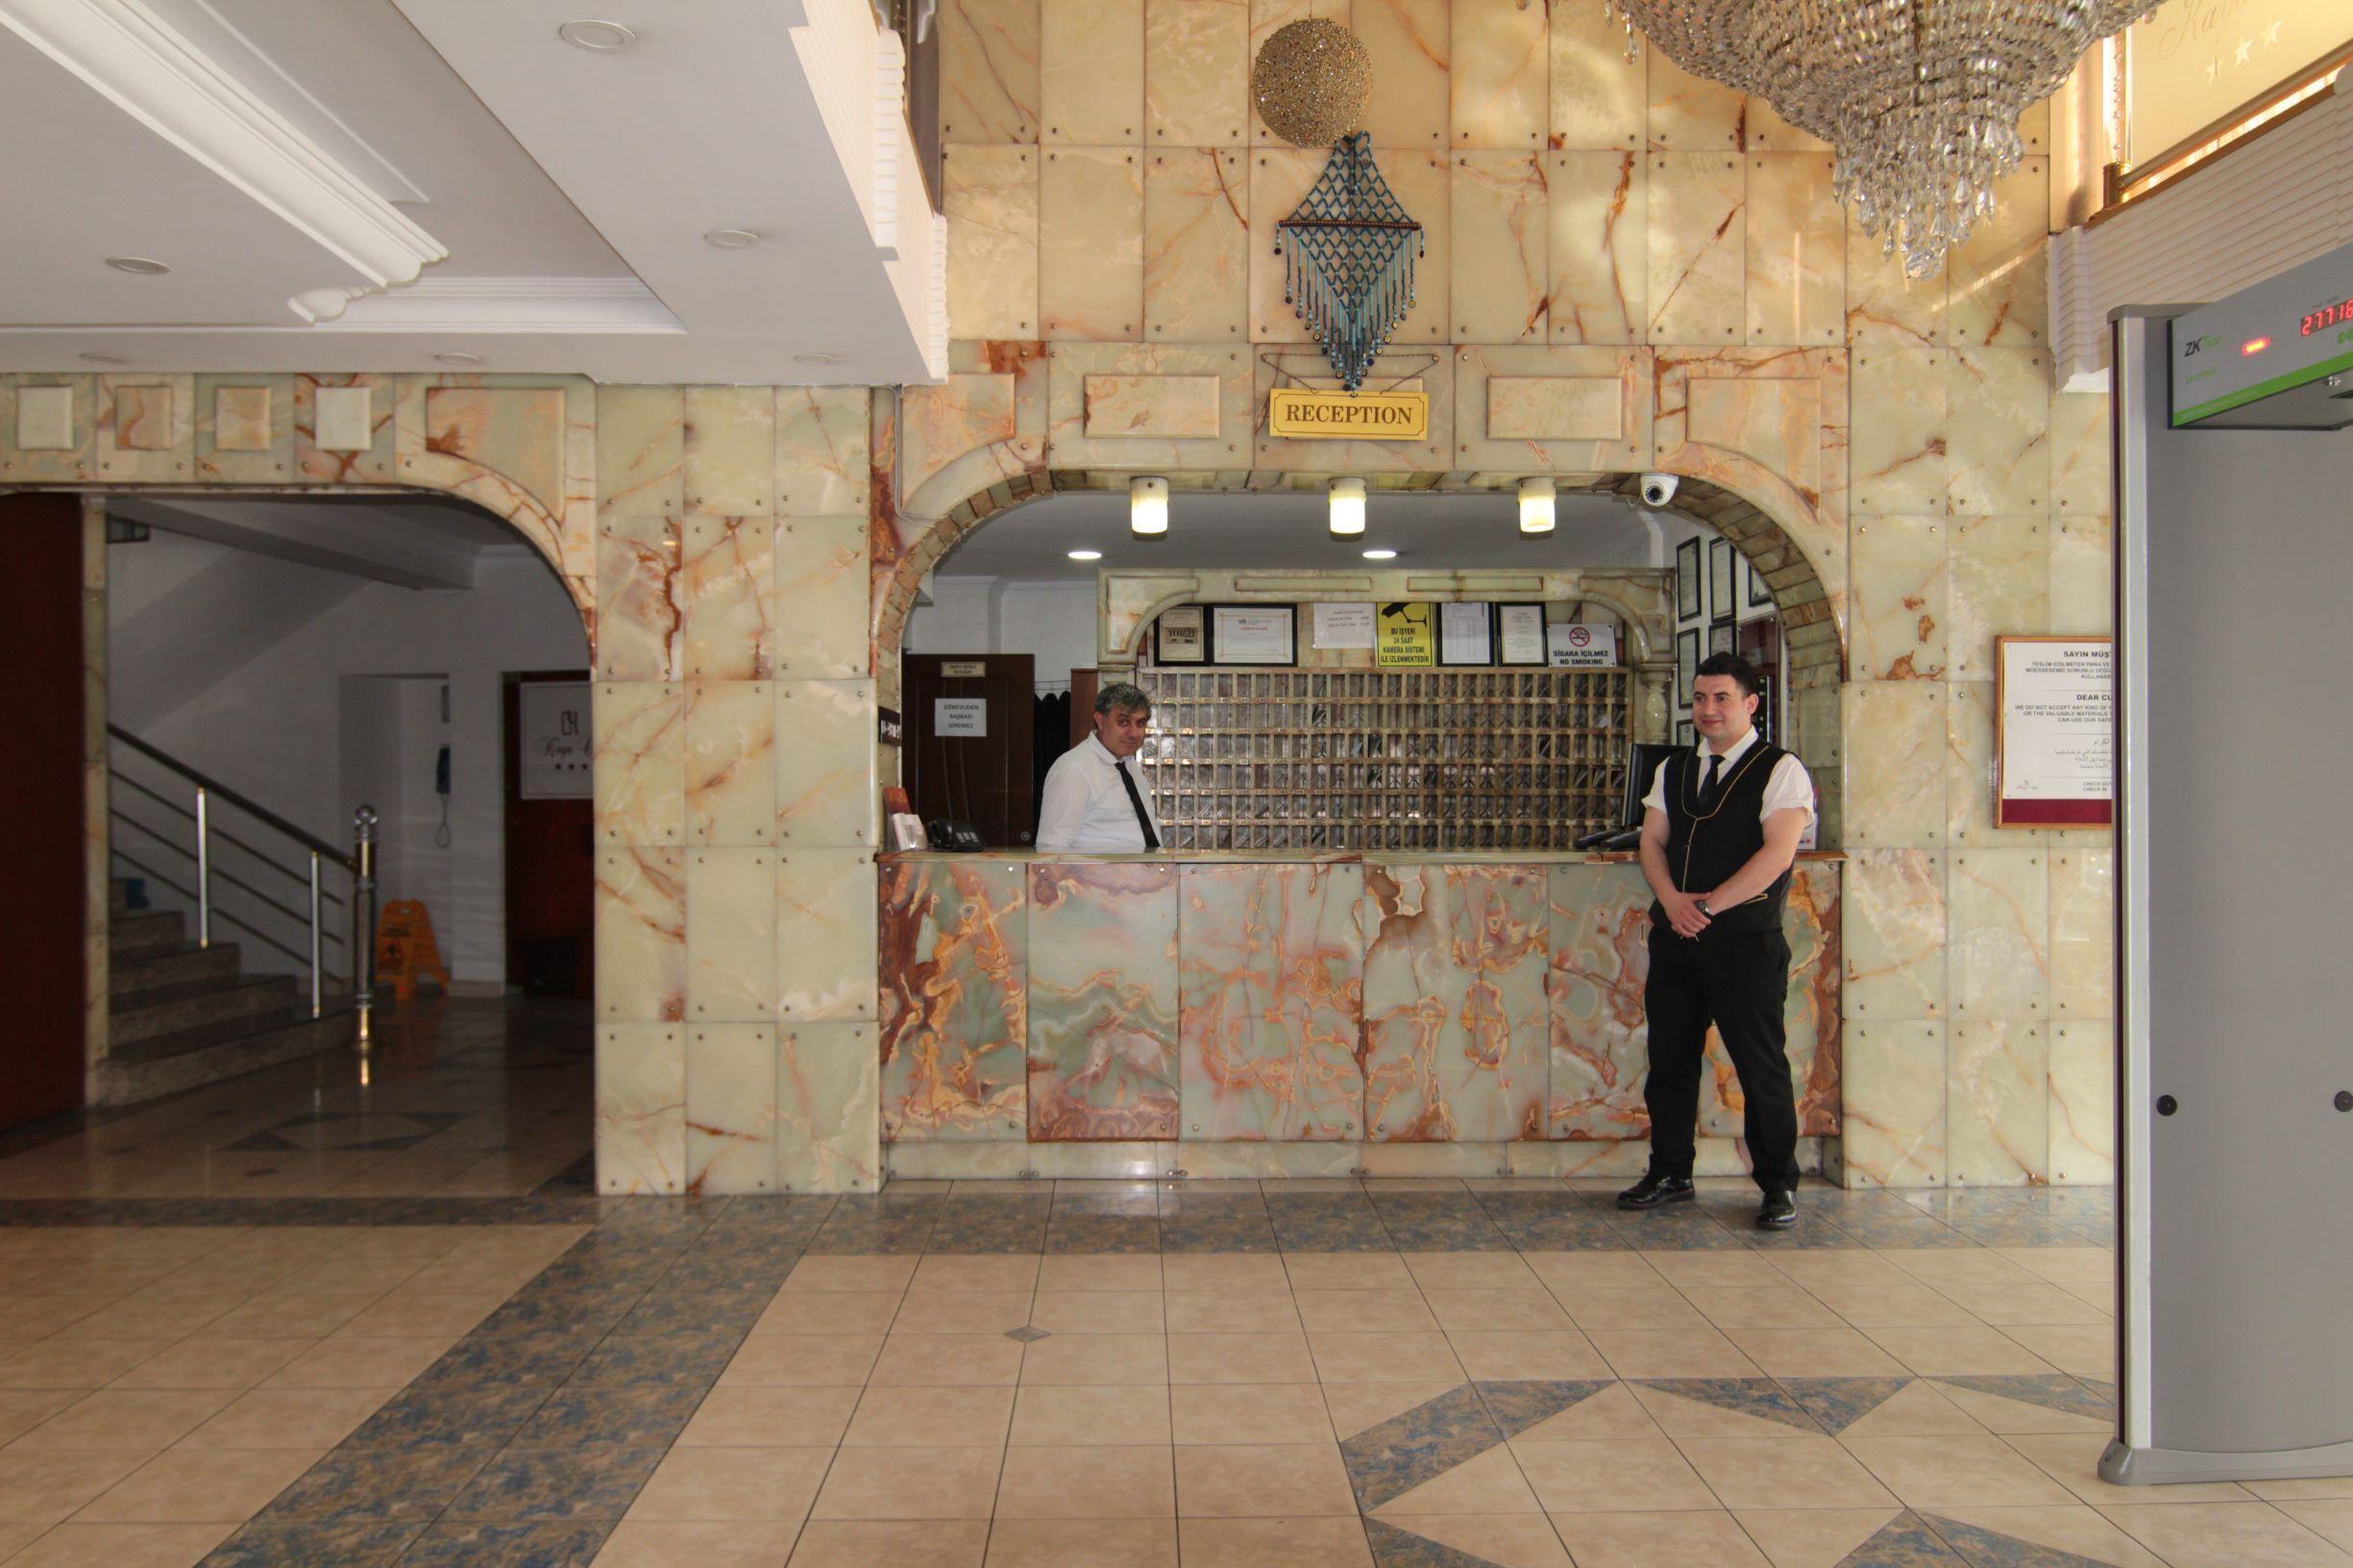 Istanbul nova godina do ek nove godine u istanbulu for Kaya madrid hotel istanbul